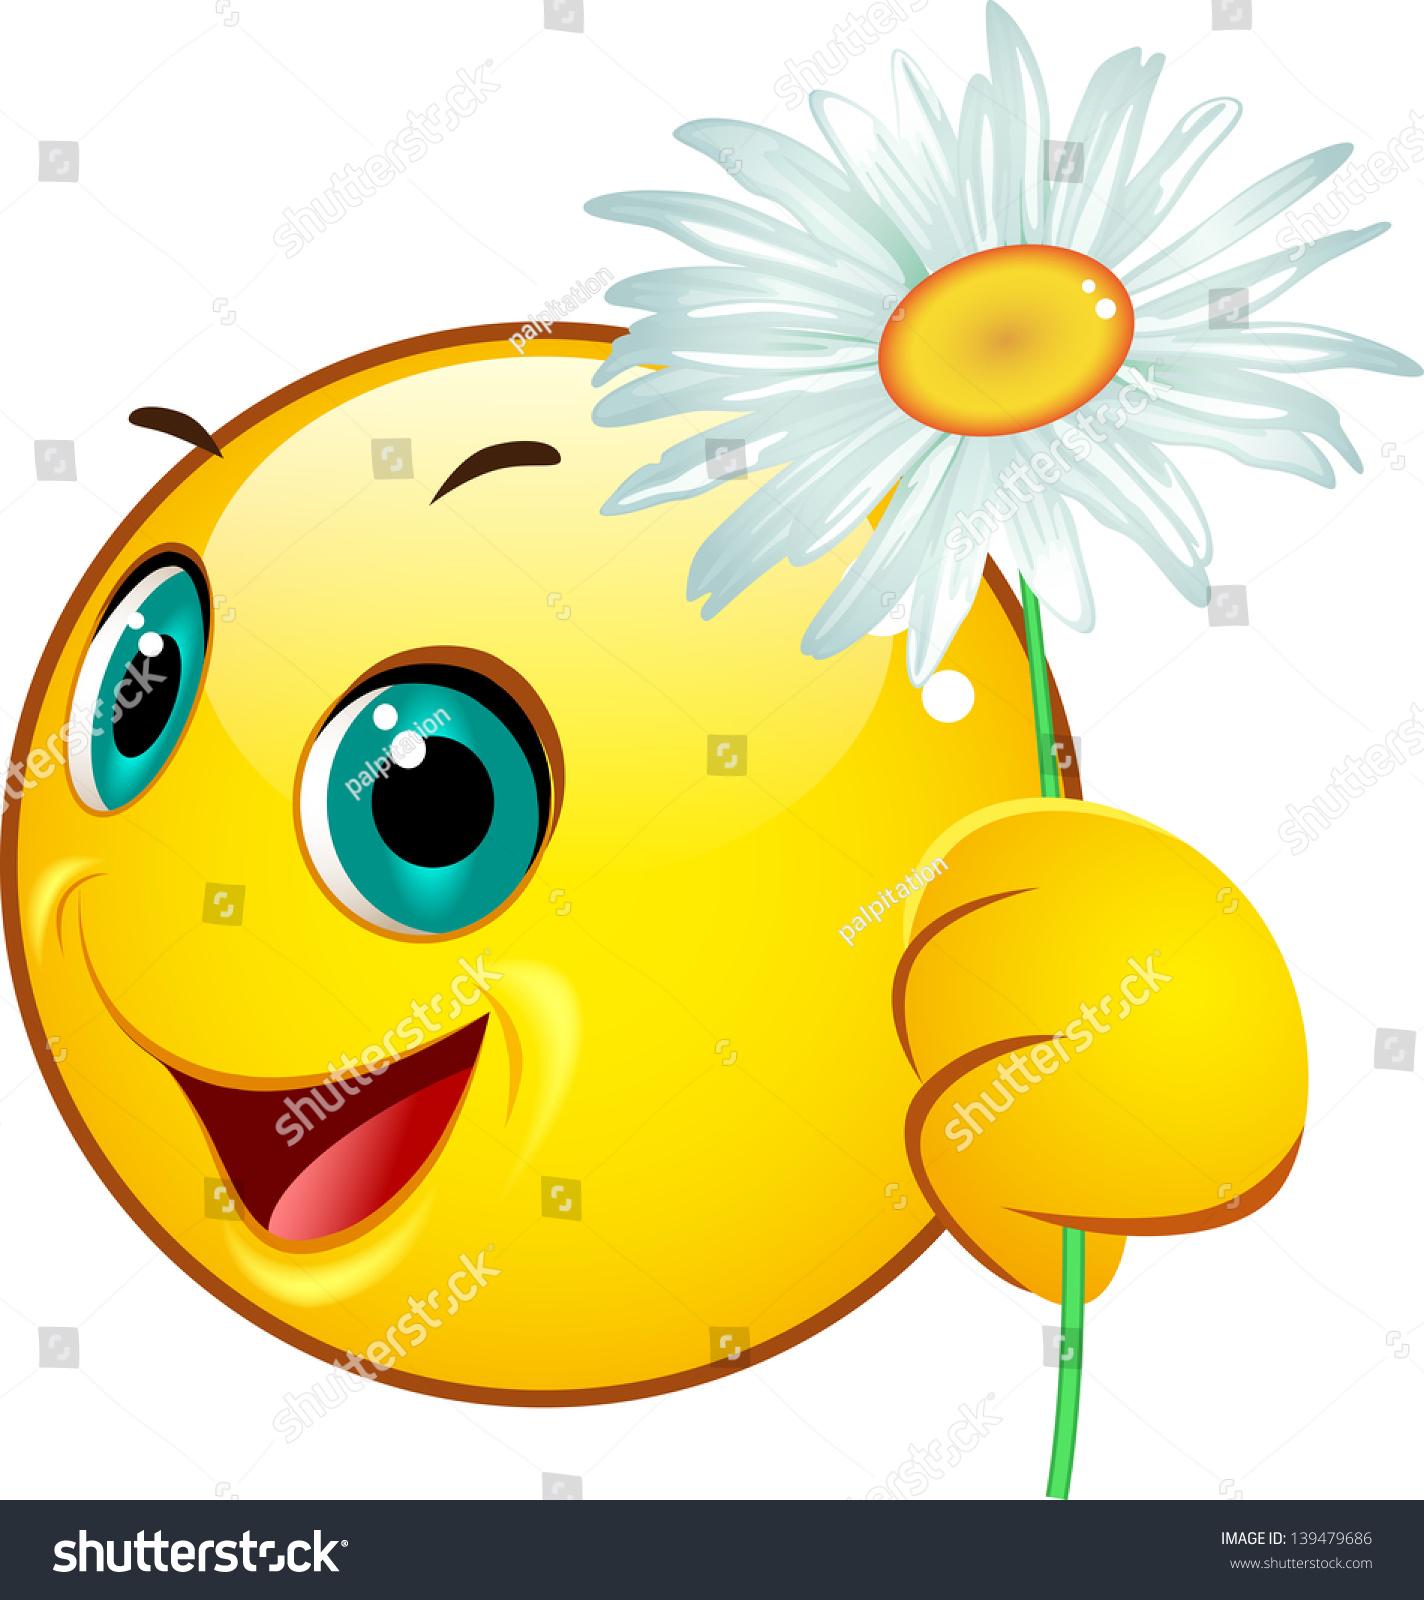 Emoticon Giving Camomile Stock Vector Shutterstock